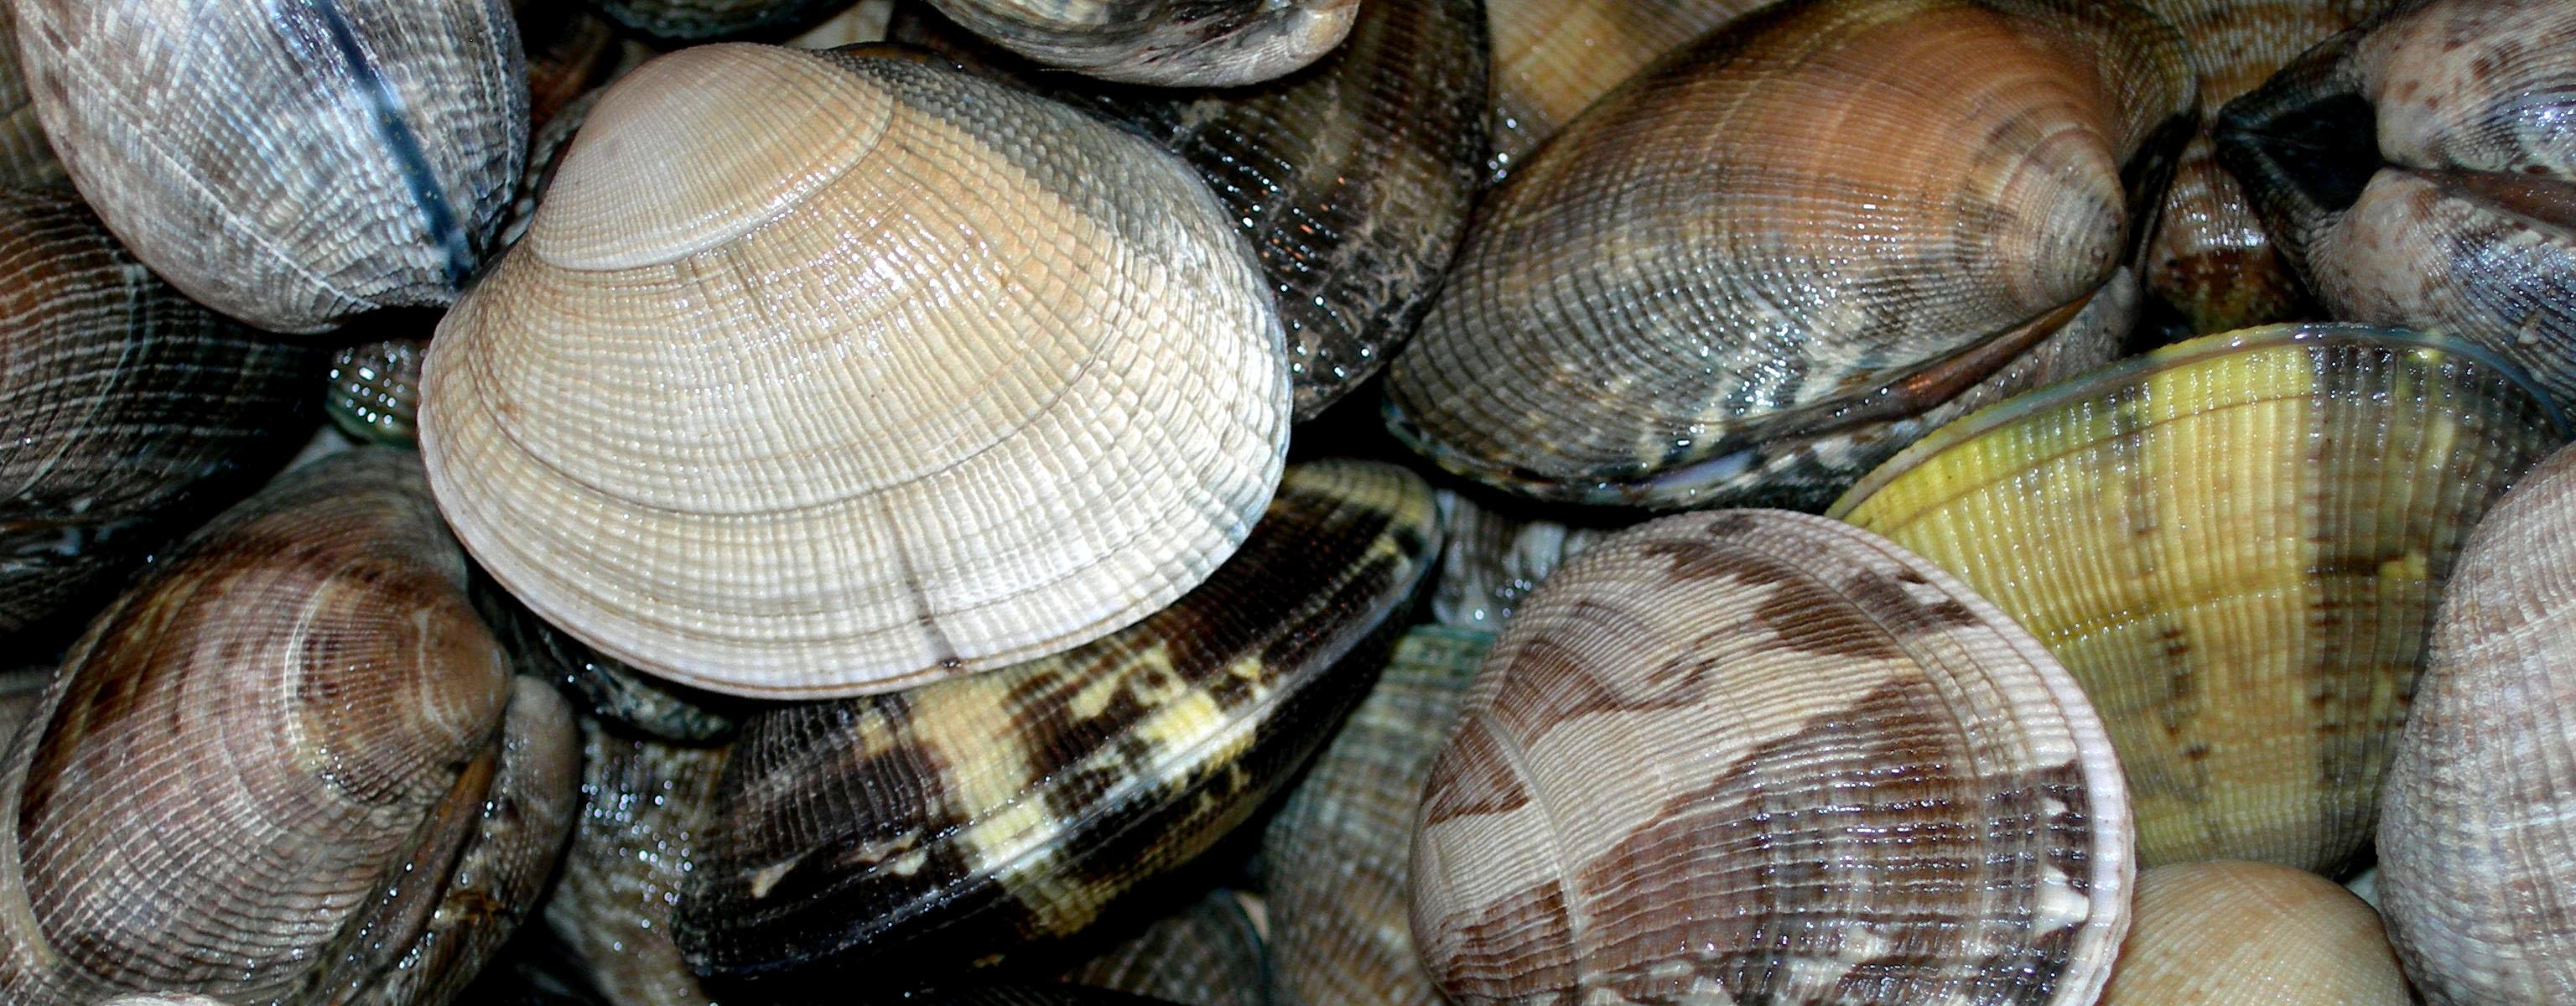 ATAO – restaurant de fruits de mer